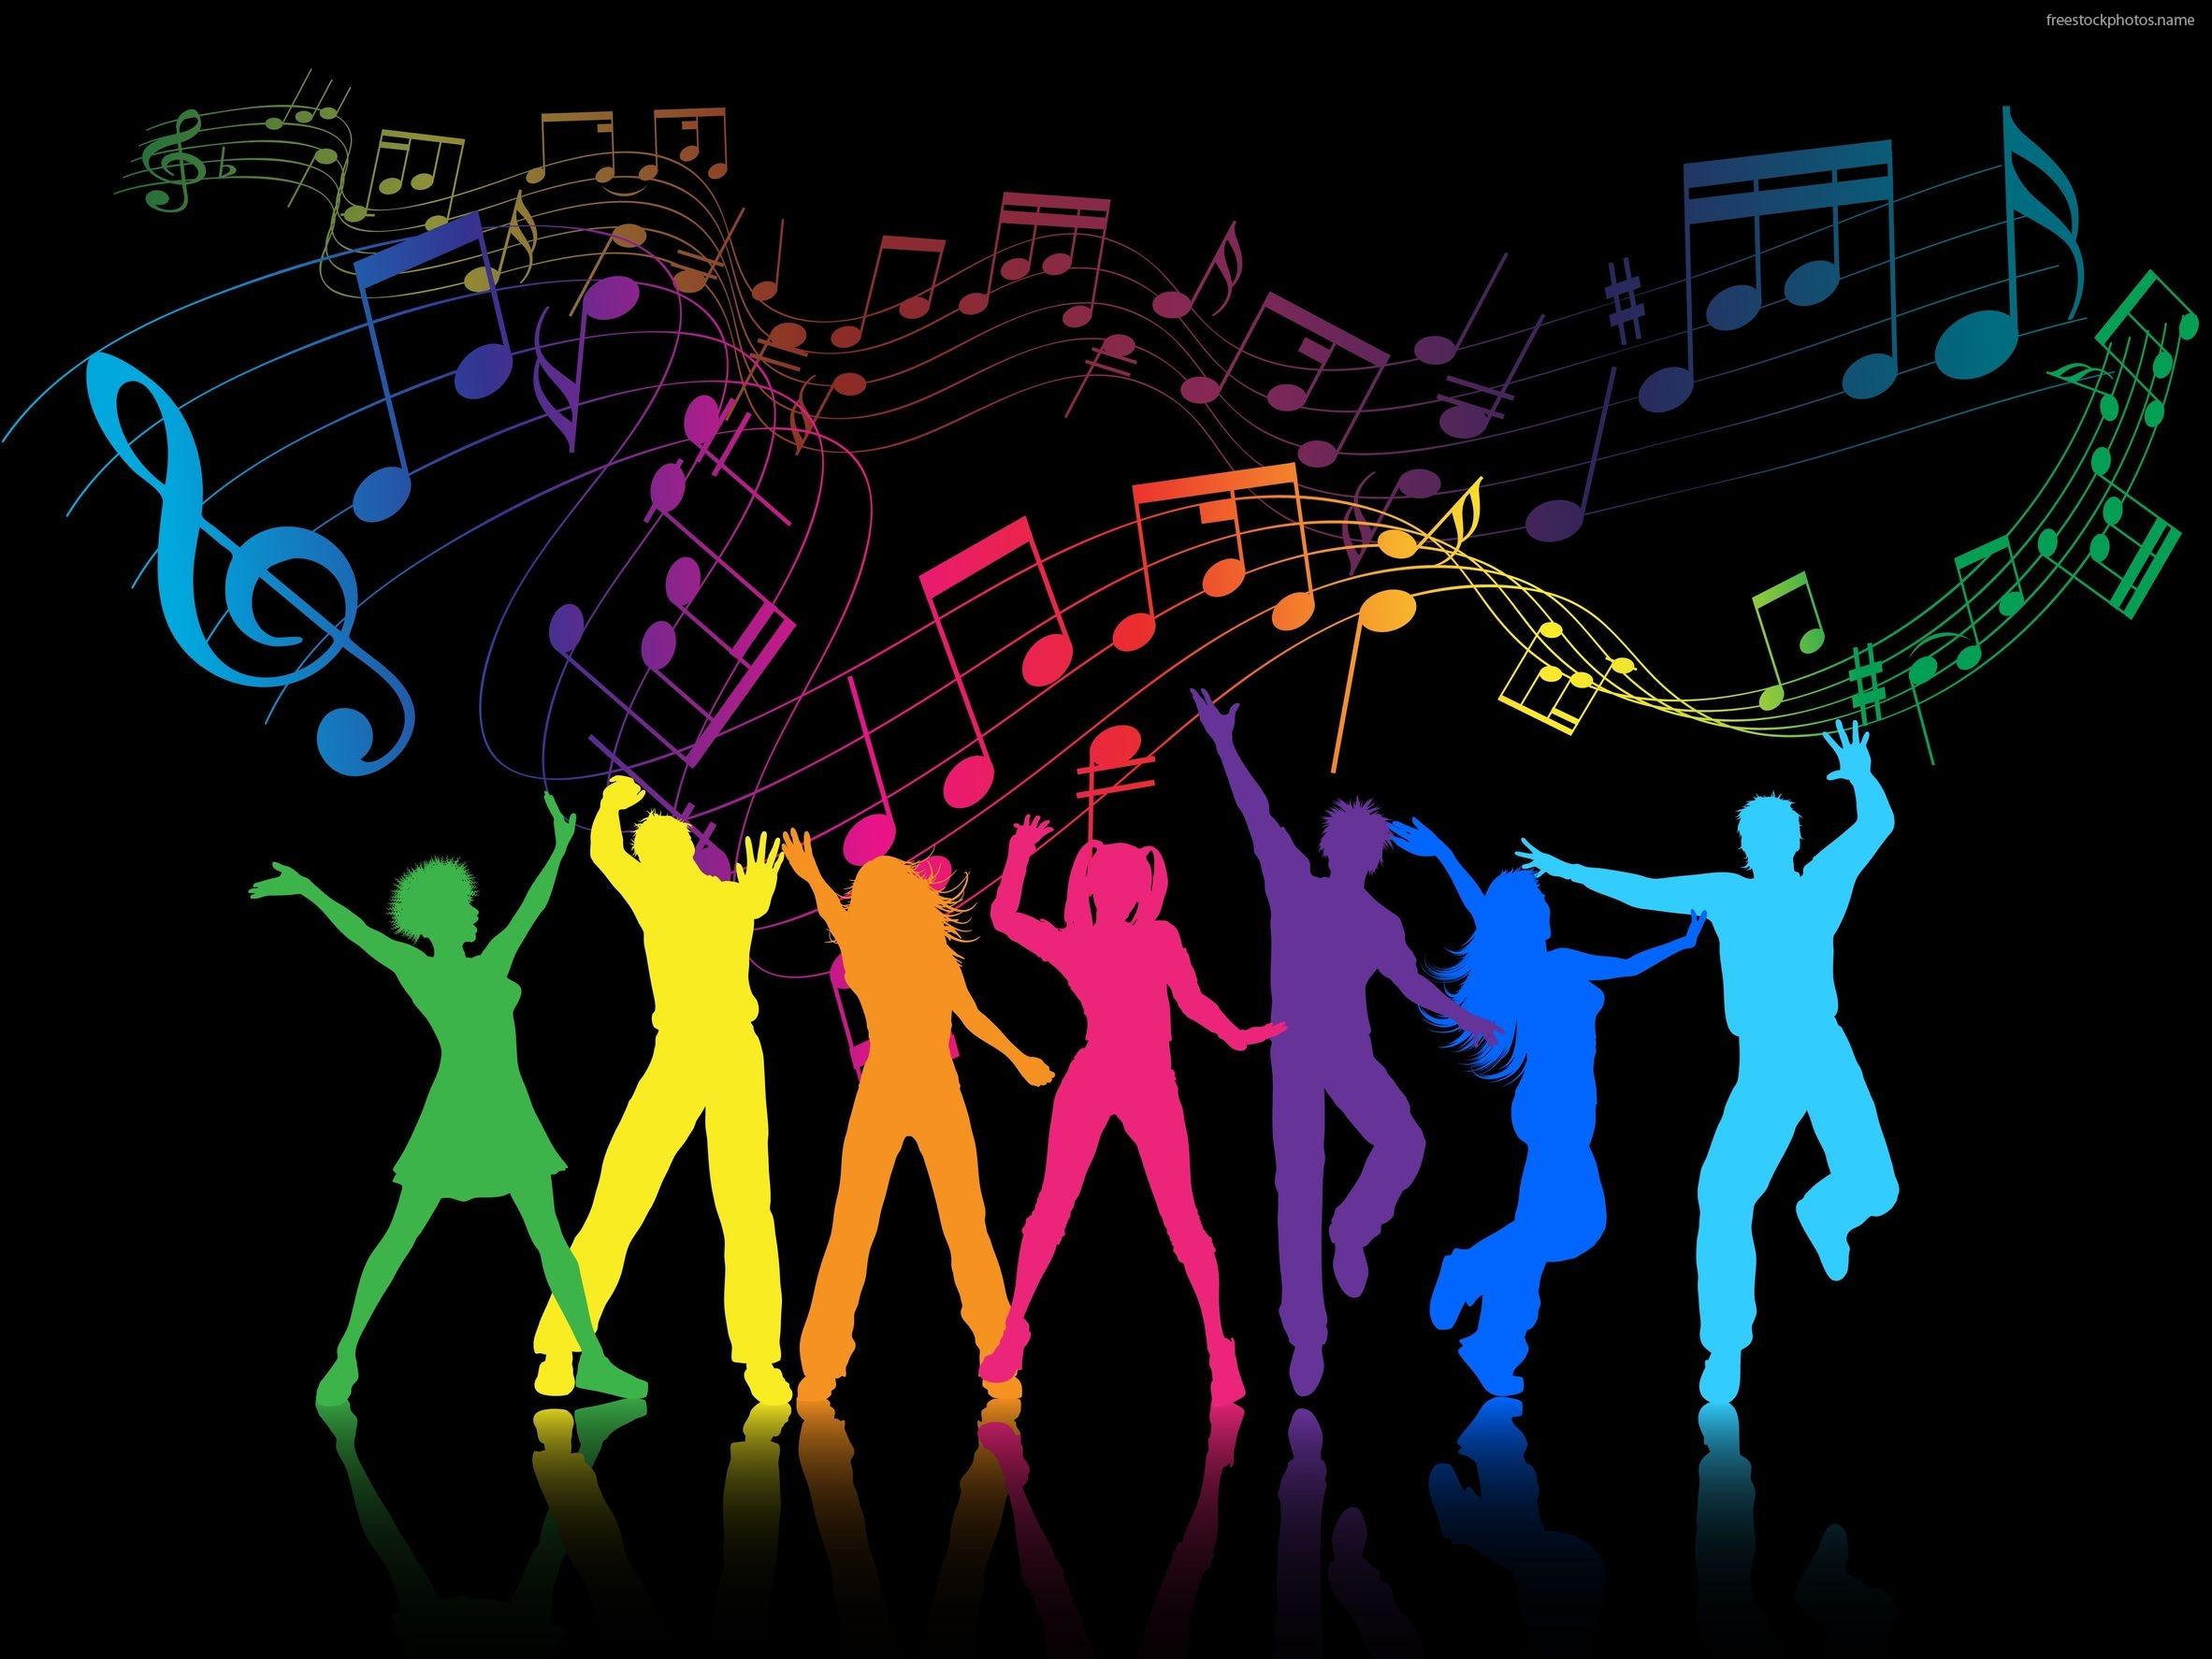 http://dancified.com/wp-content/uploads/2014/09/dance-colour.jpg